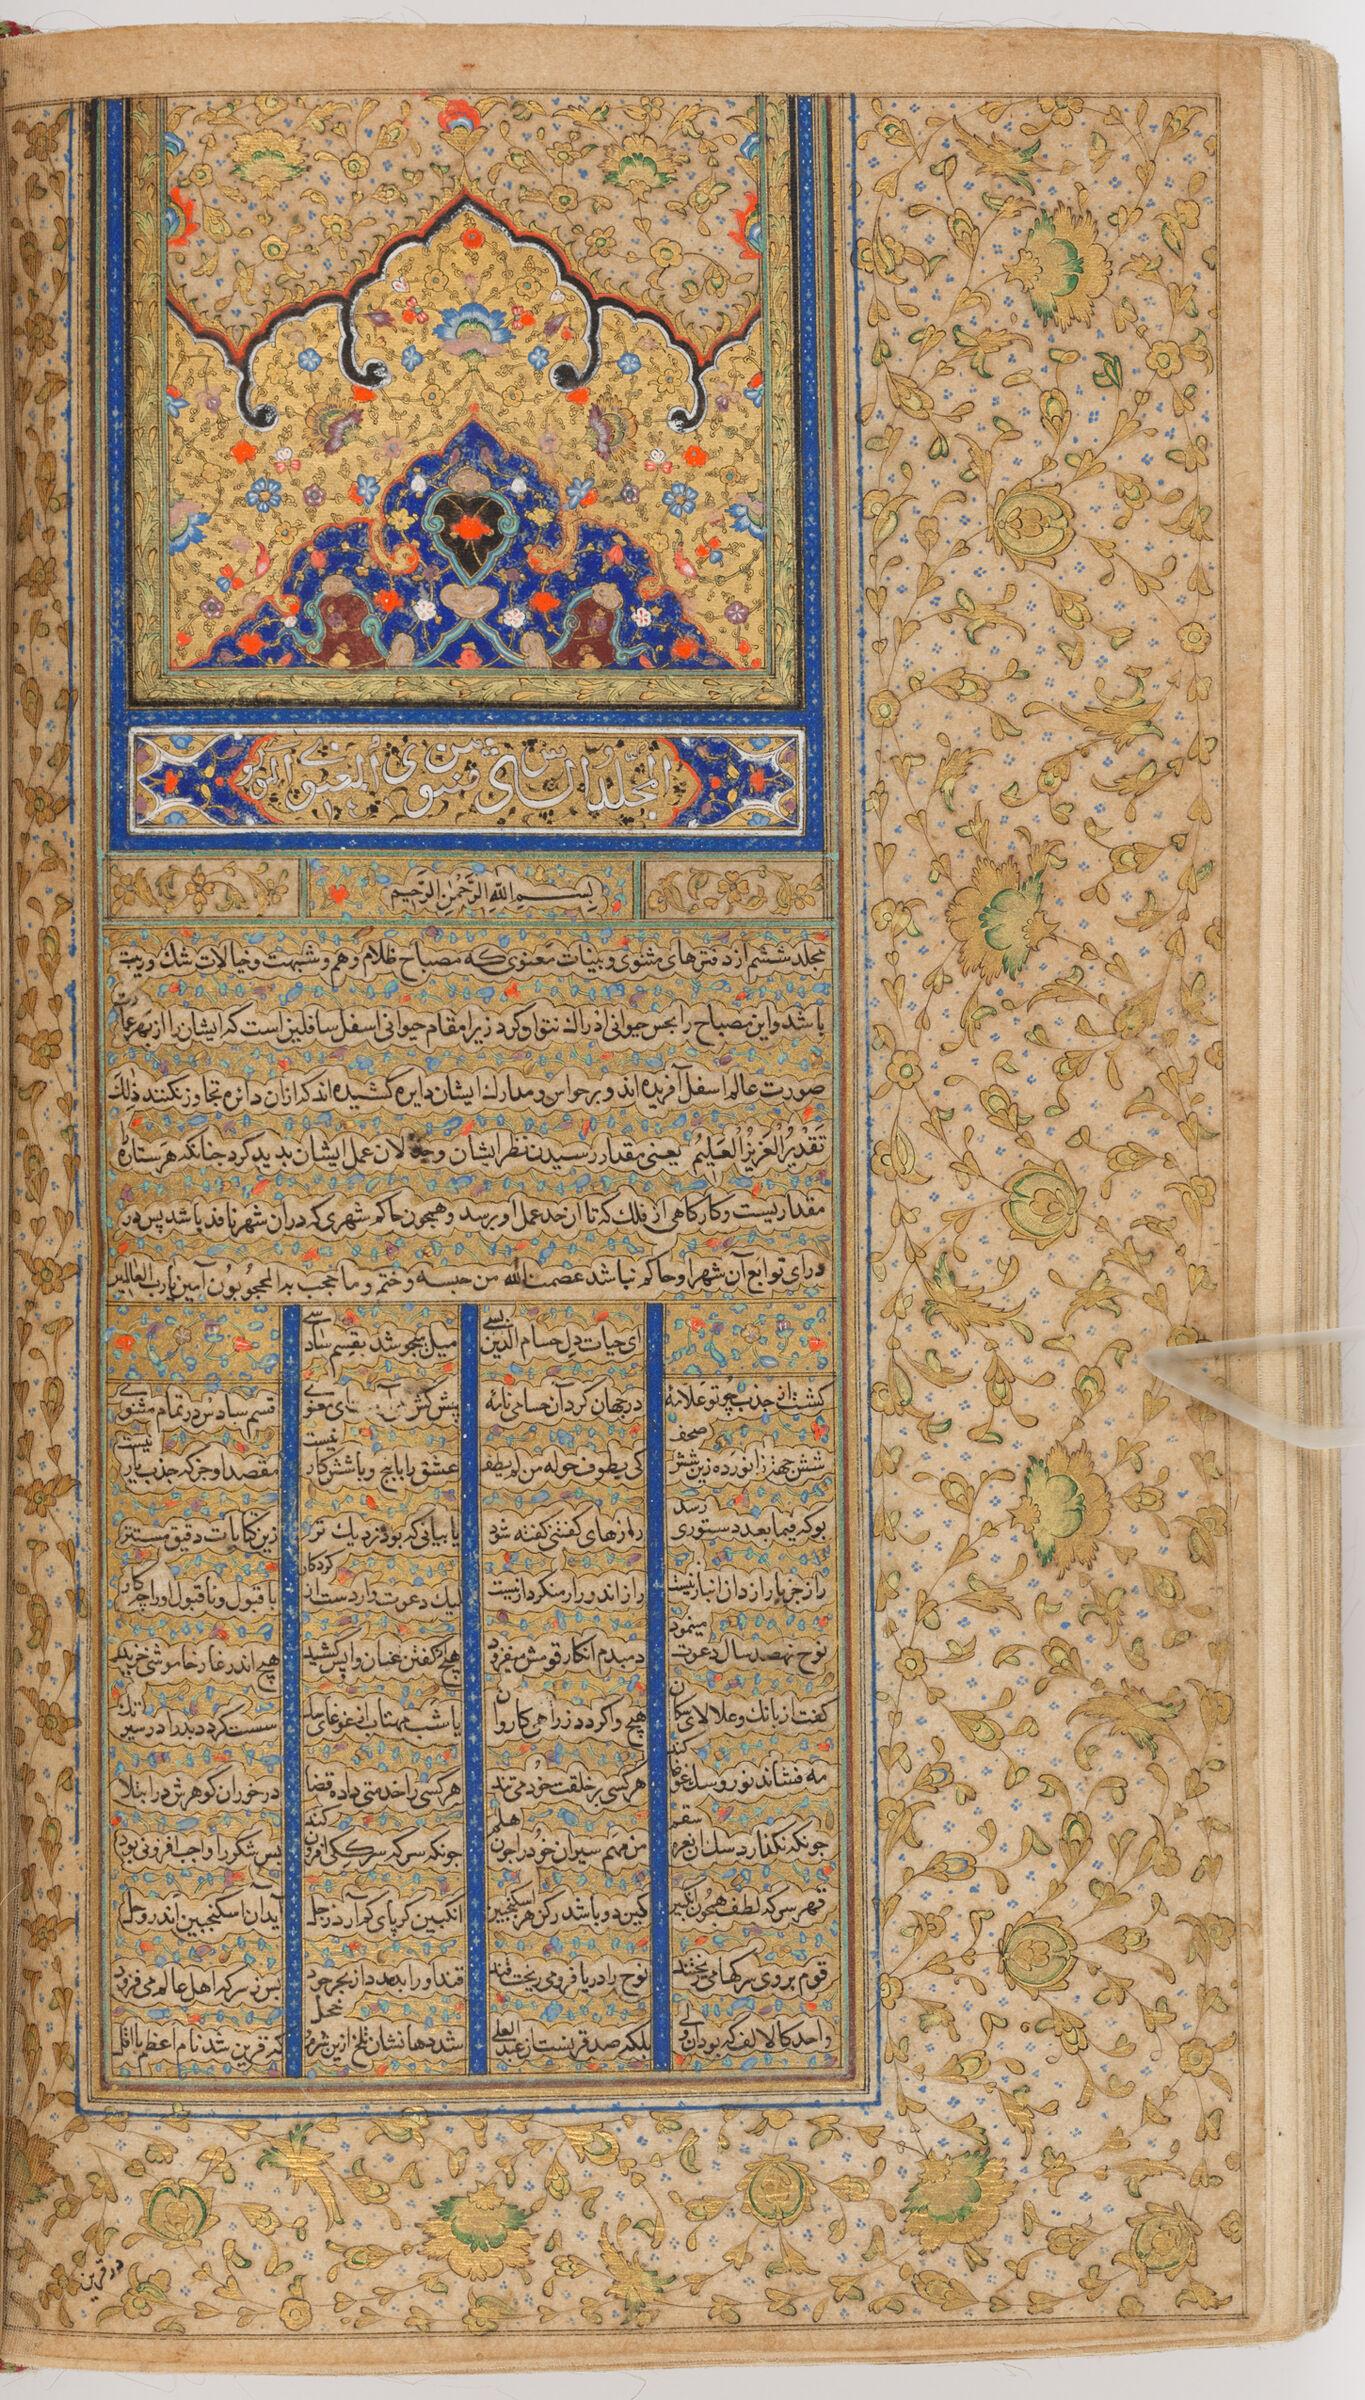 Illuminated Sarlawh Of The Sixth Section (Blank Recto; Sarlawh Verso Of Folio 240), Folio From A Manuscript Of The Mathnavi Ma'navi By Maulana Jalal Al-Din Rumi